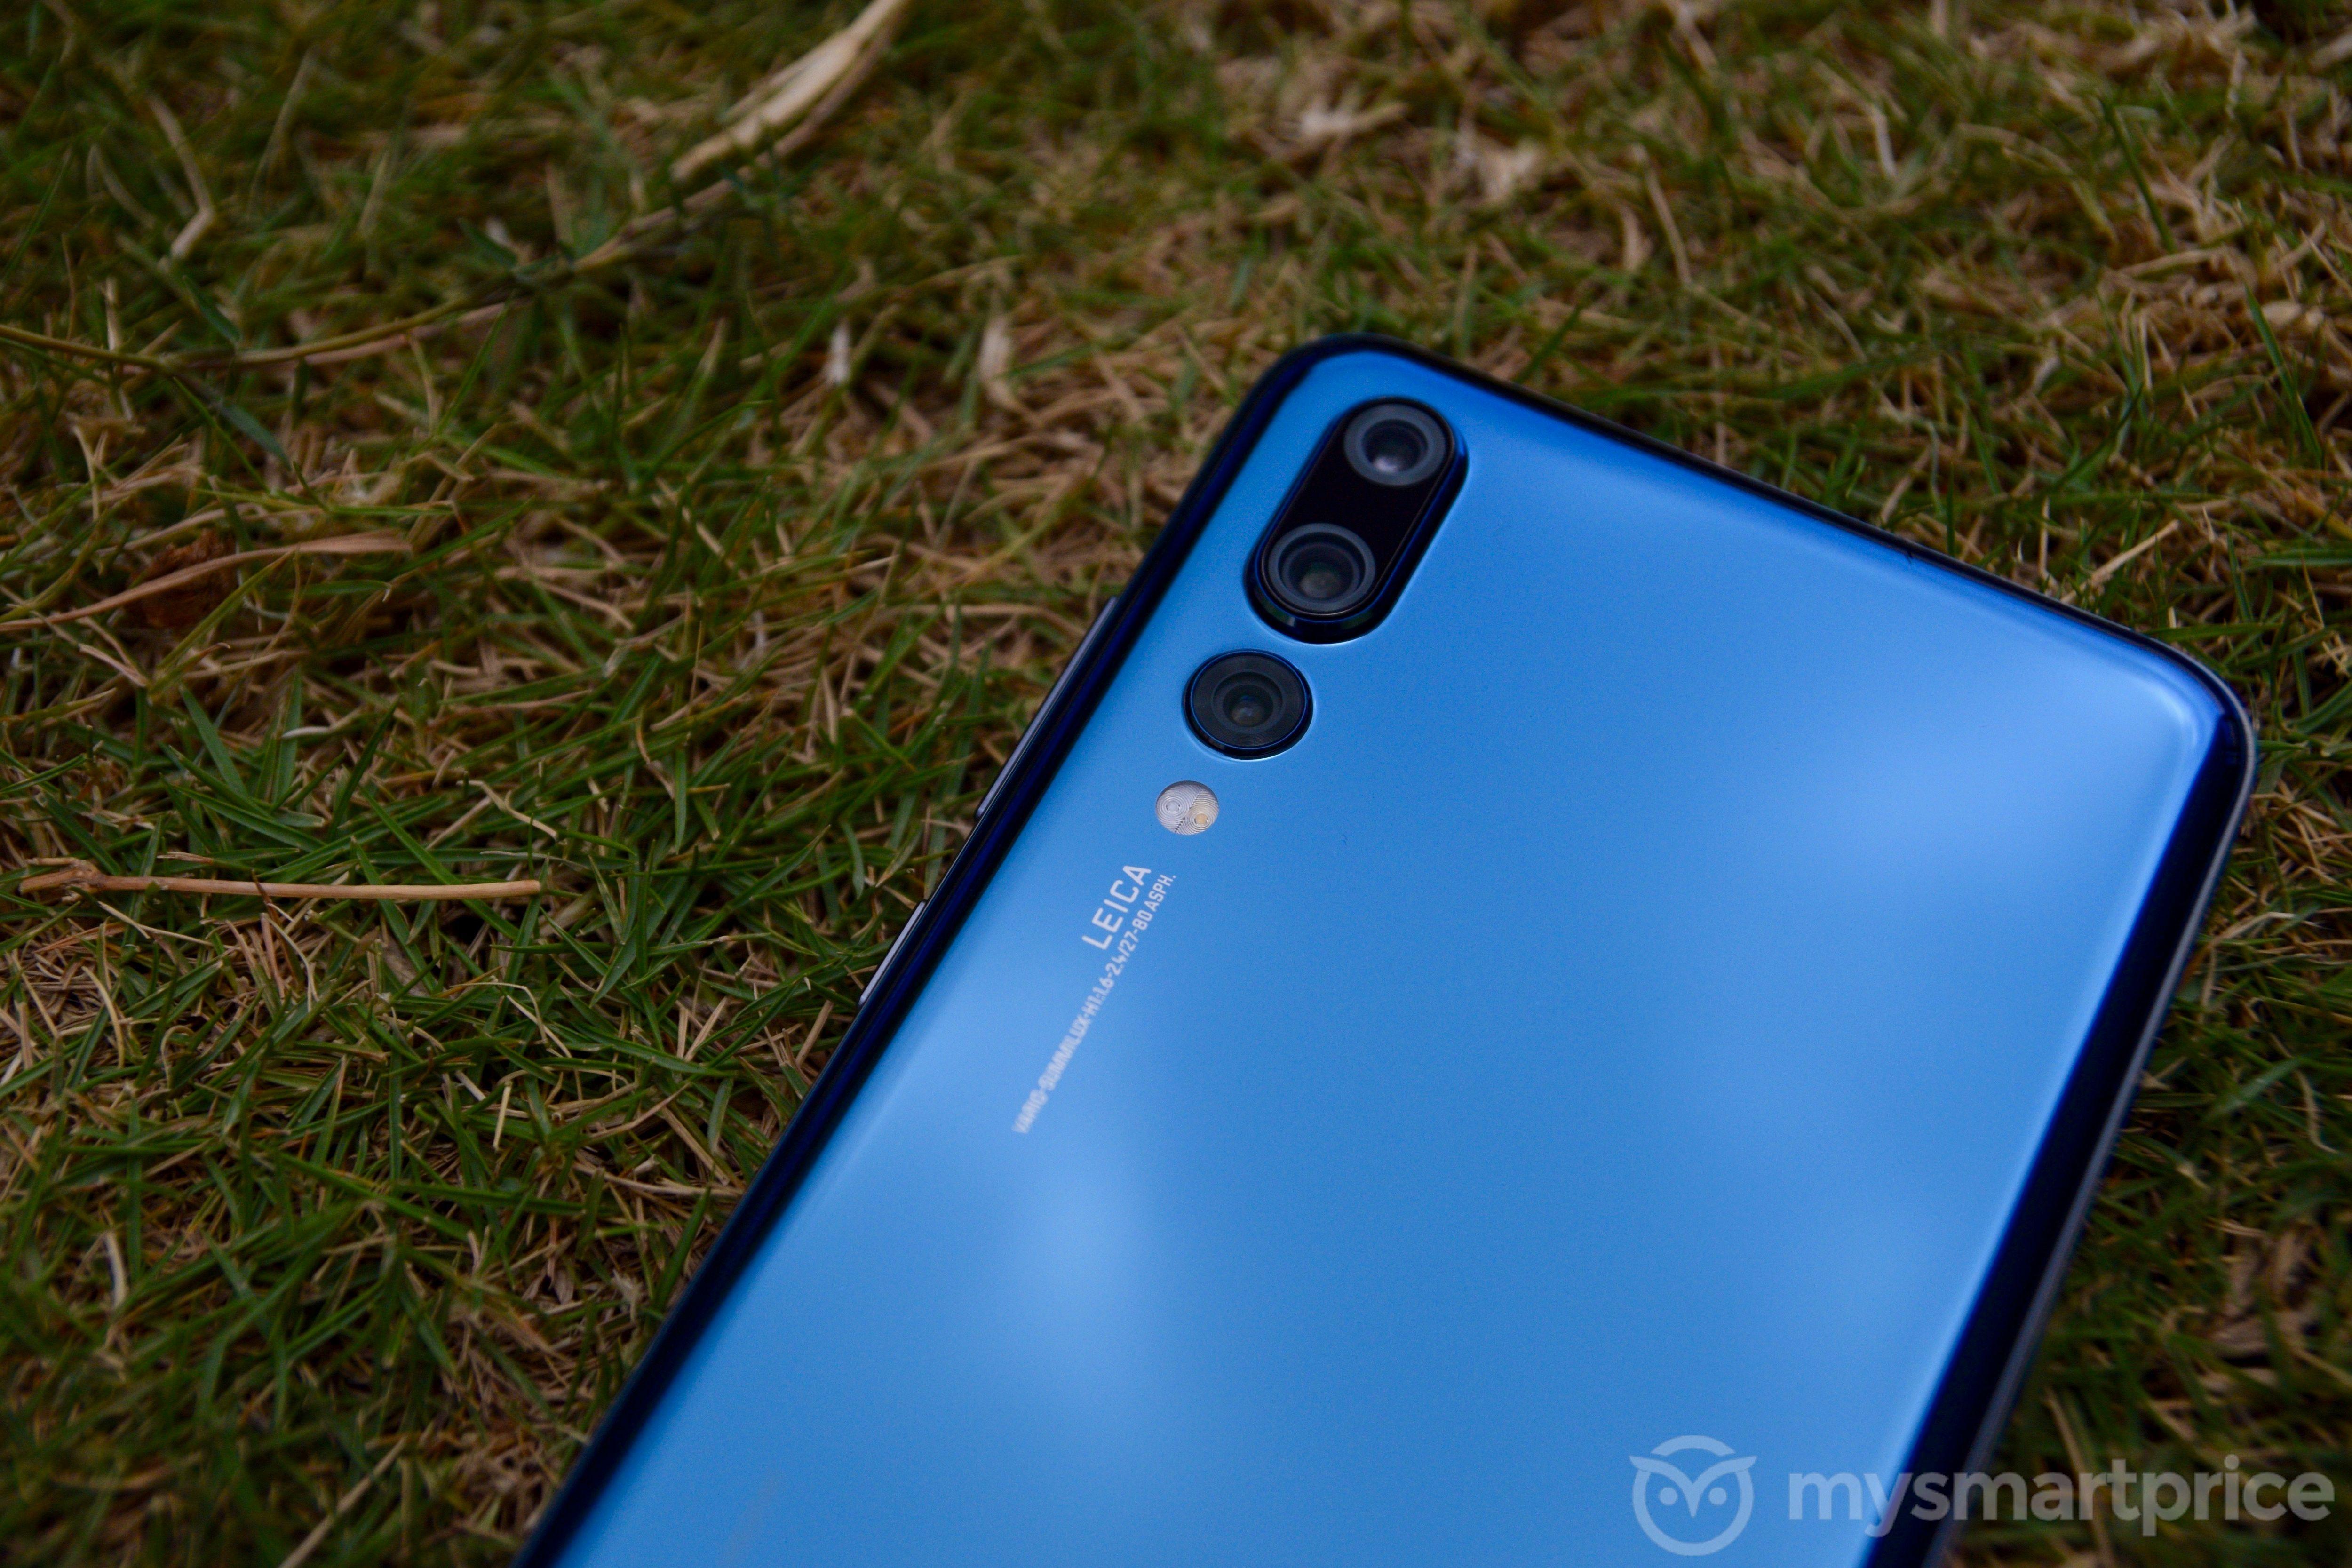 Huawei P20 Pro Review: Flagship Class Imaging Powerhouse - MySmartPrice